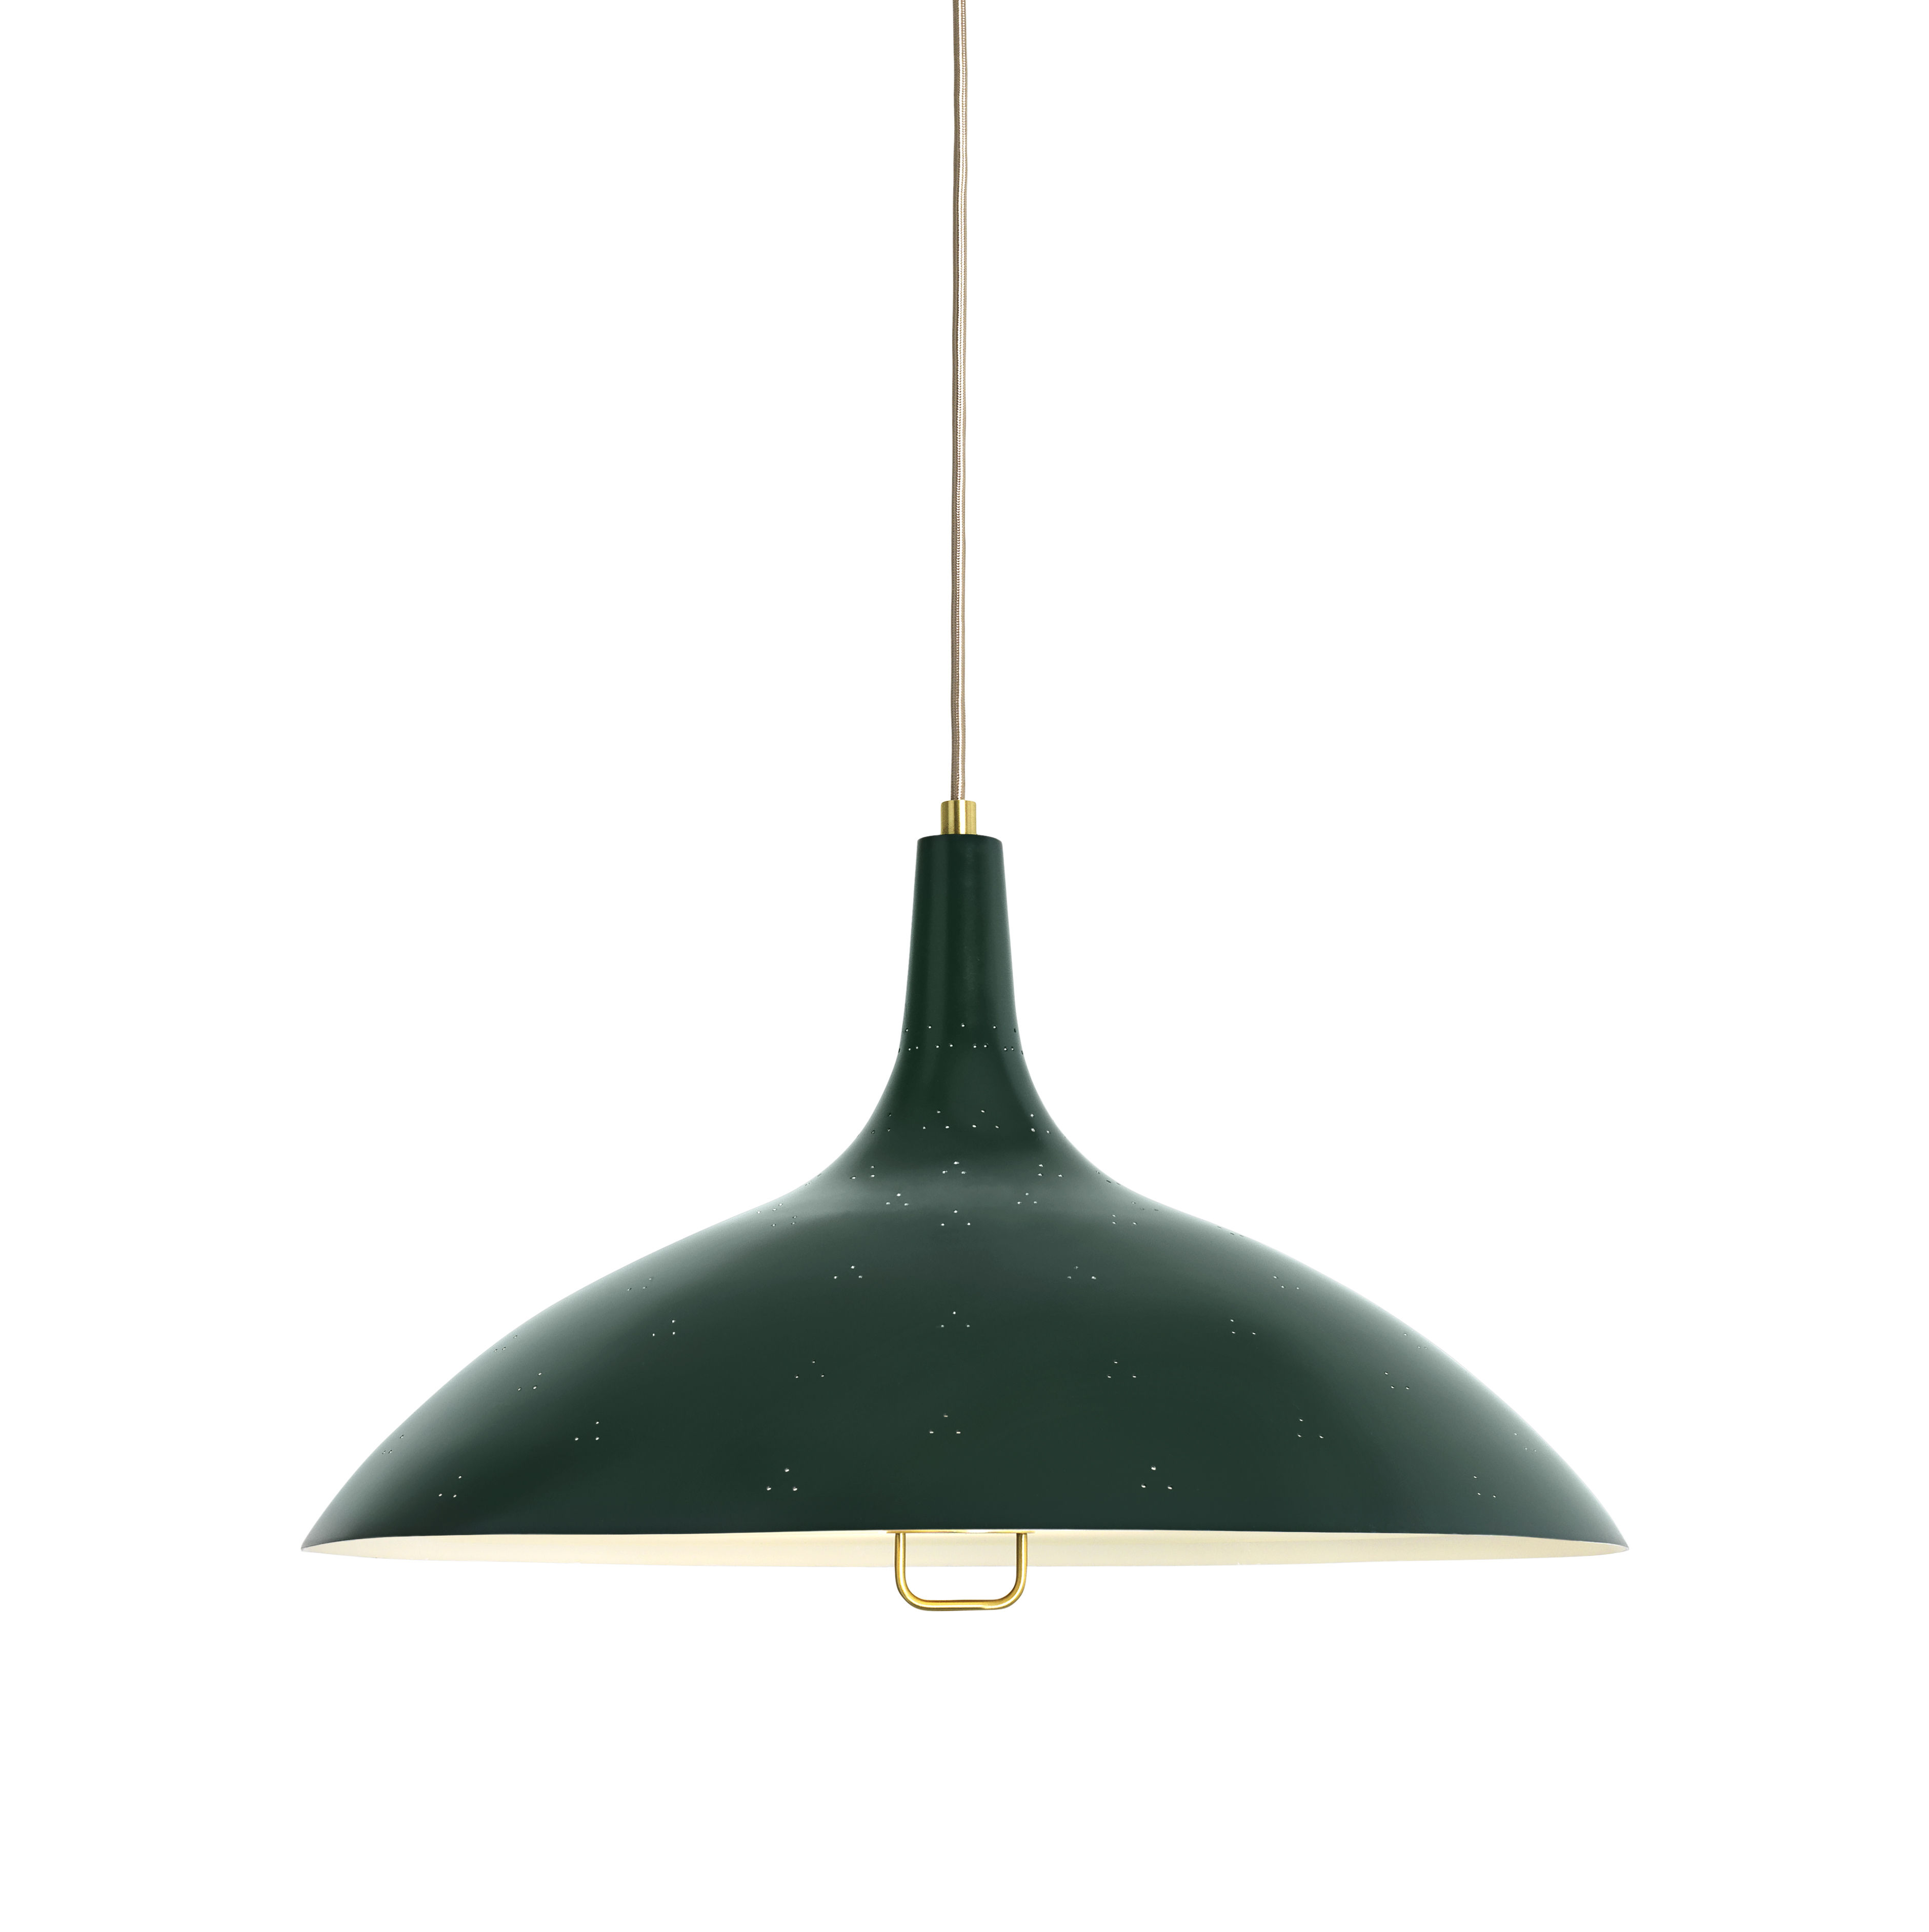 Lighting - Pendant Lighting - 1965 Pendant - / Ø 46 cm - 1947 reissue by Gubi - Green - Frosted glass, Painted brass